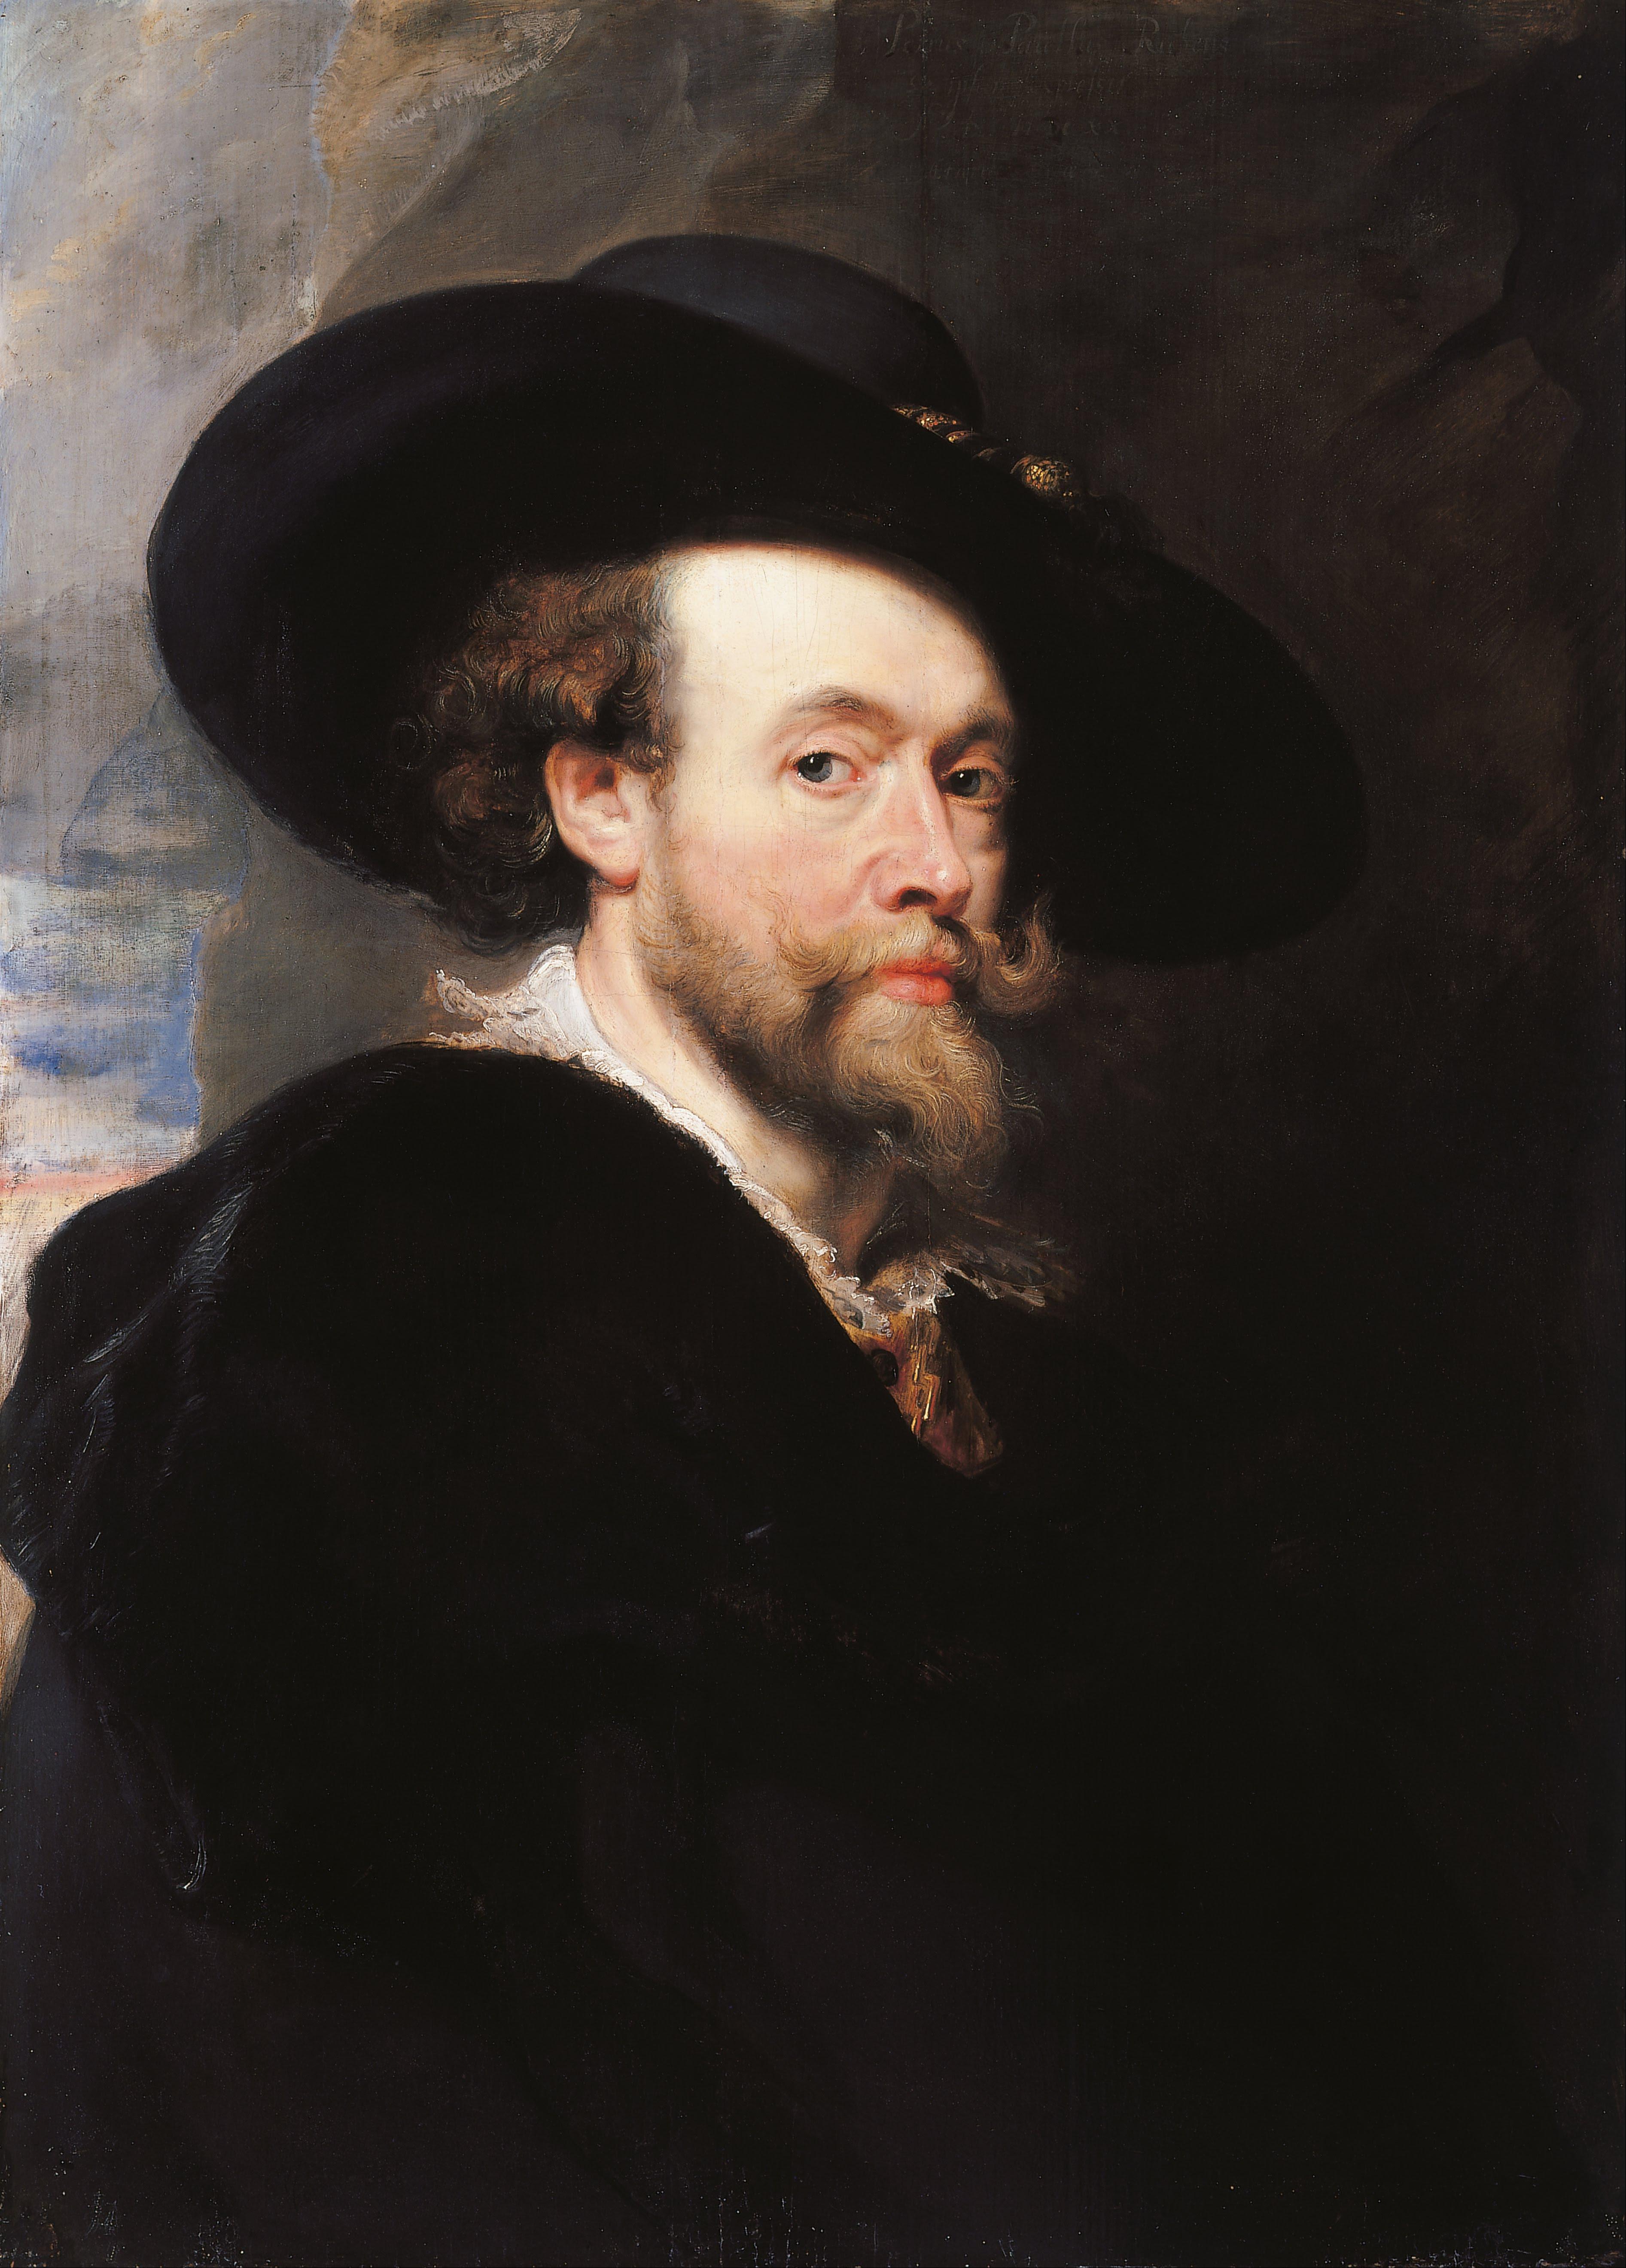 Depiction of Pedro Pablo Rubens